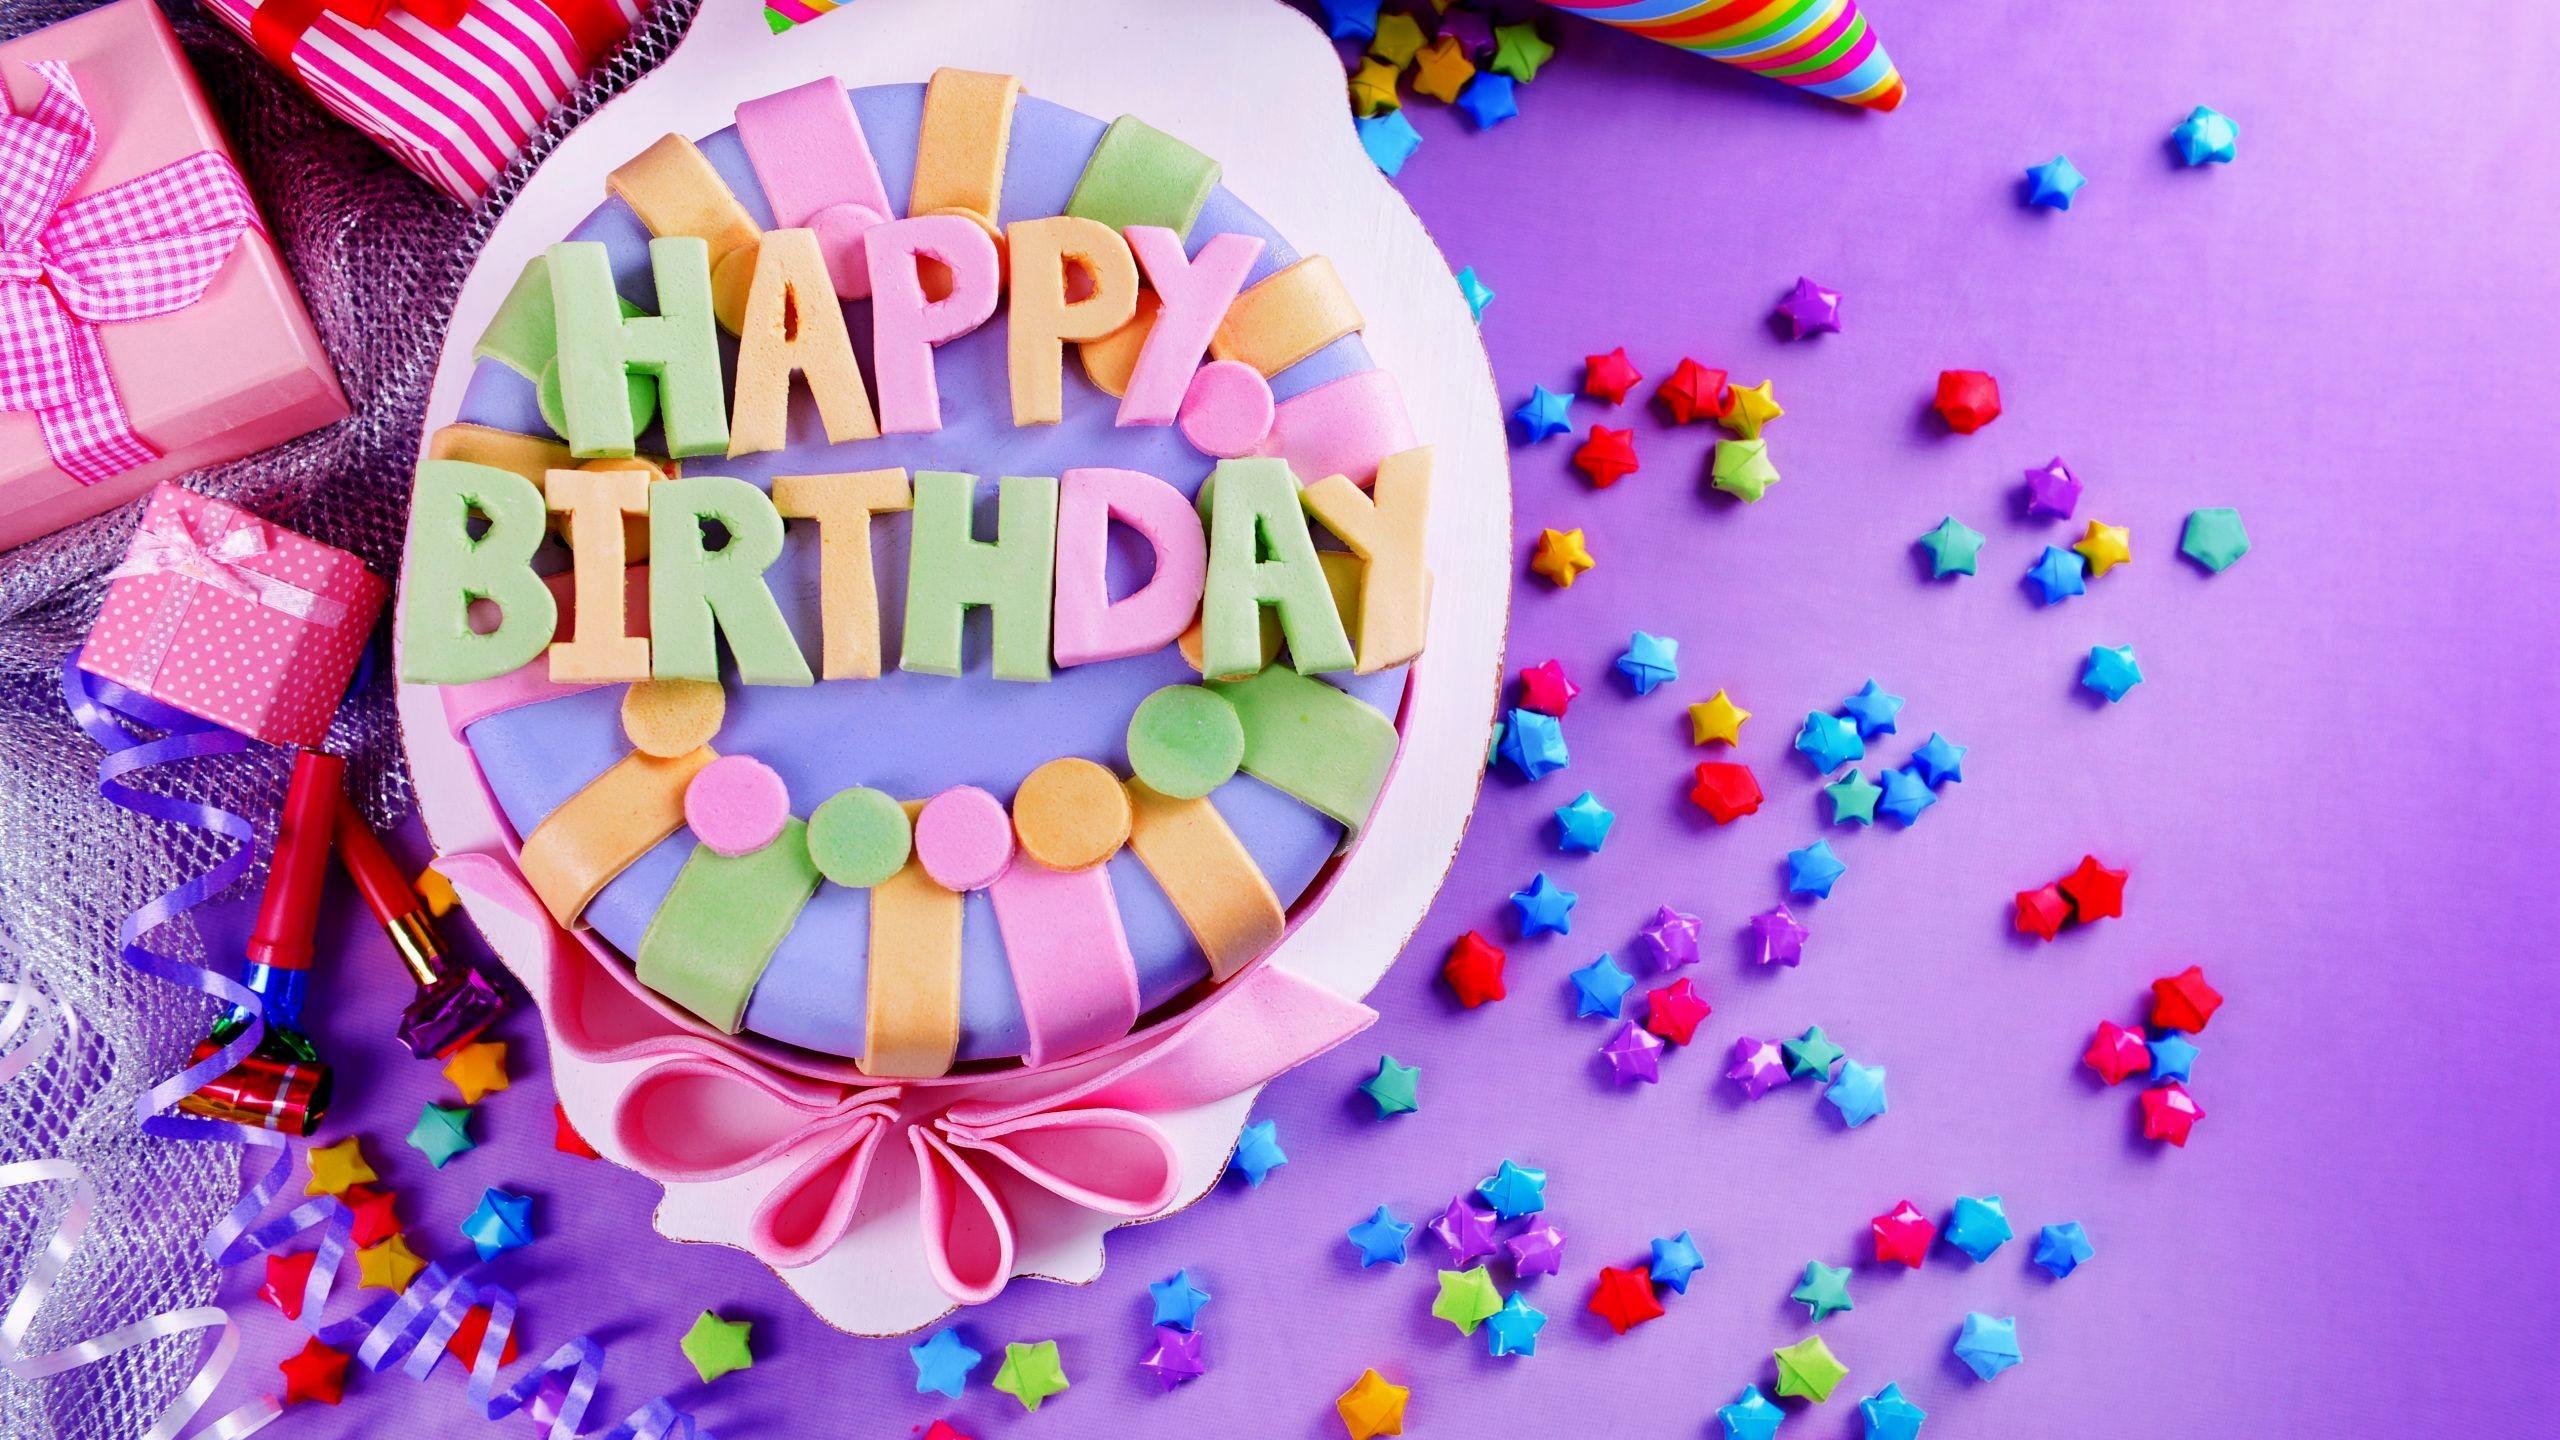 Happy - Cake Happy Birthday 4k , HD Wallpaper & Backgrounds